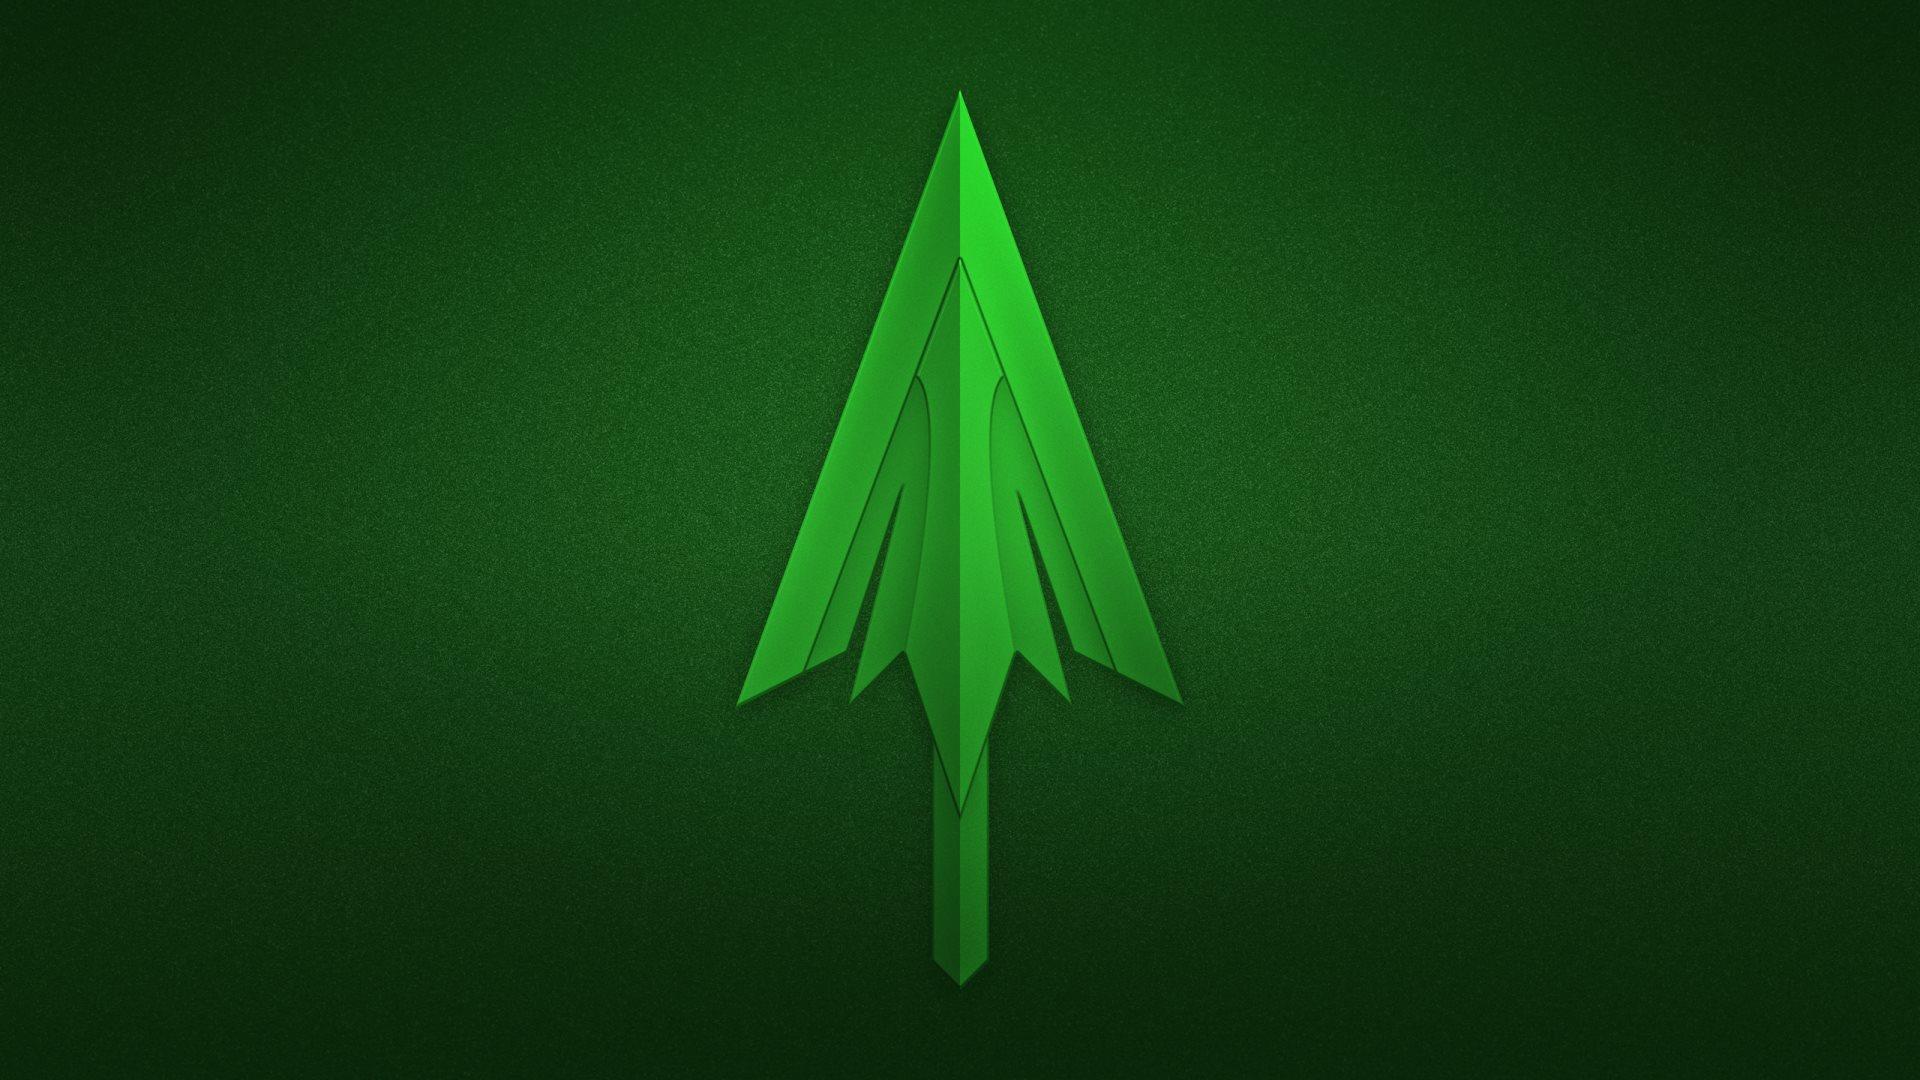 Green Arrow Wallpapers - WallpaperSafari Green Arrow Superhero Logo